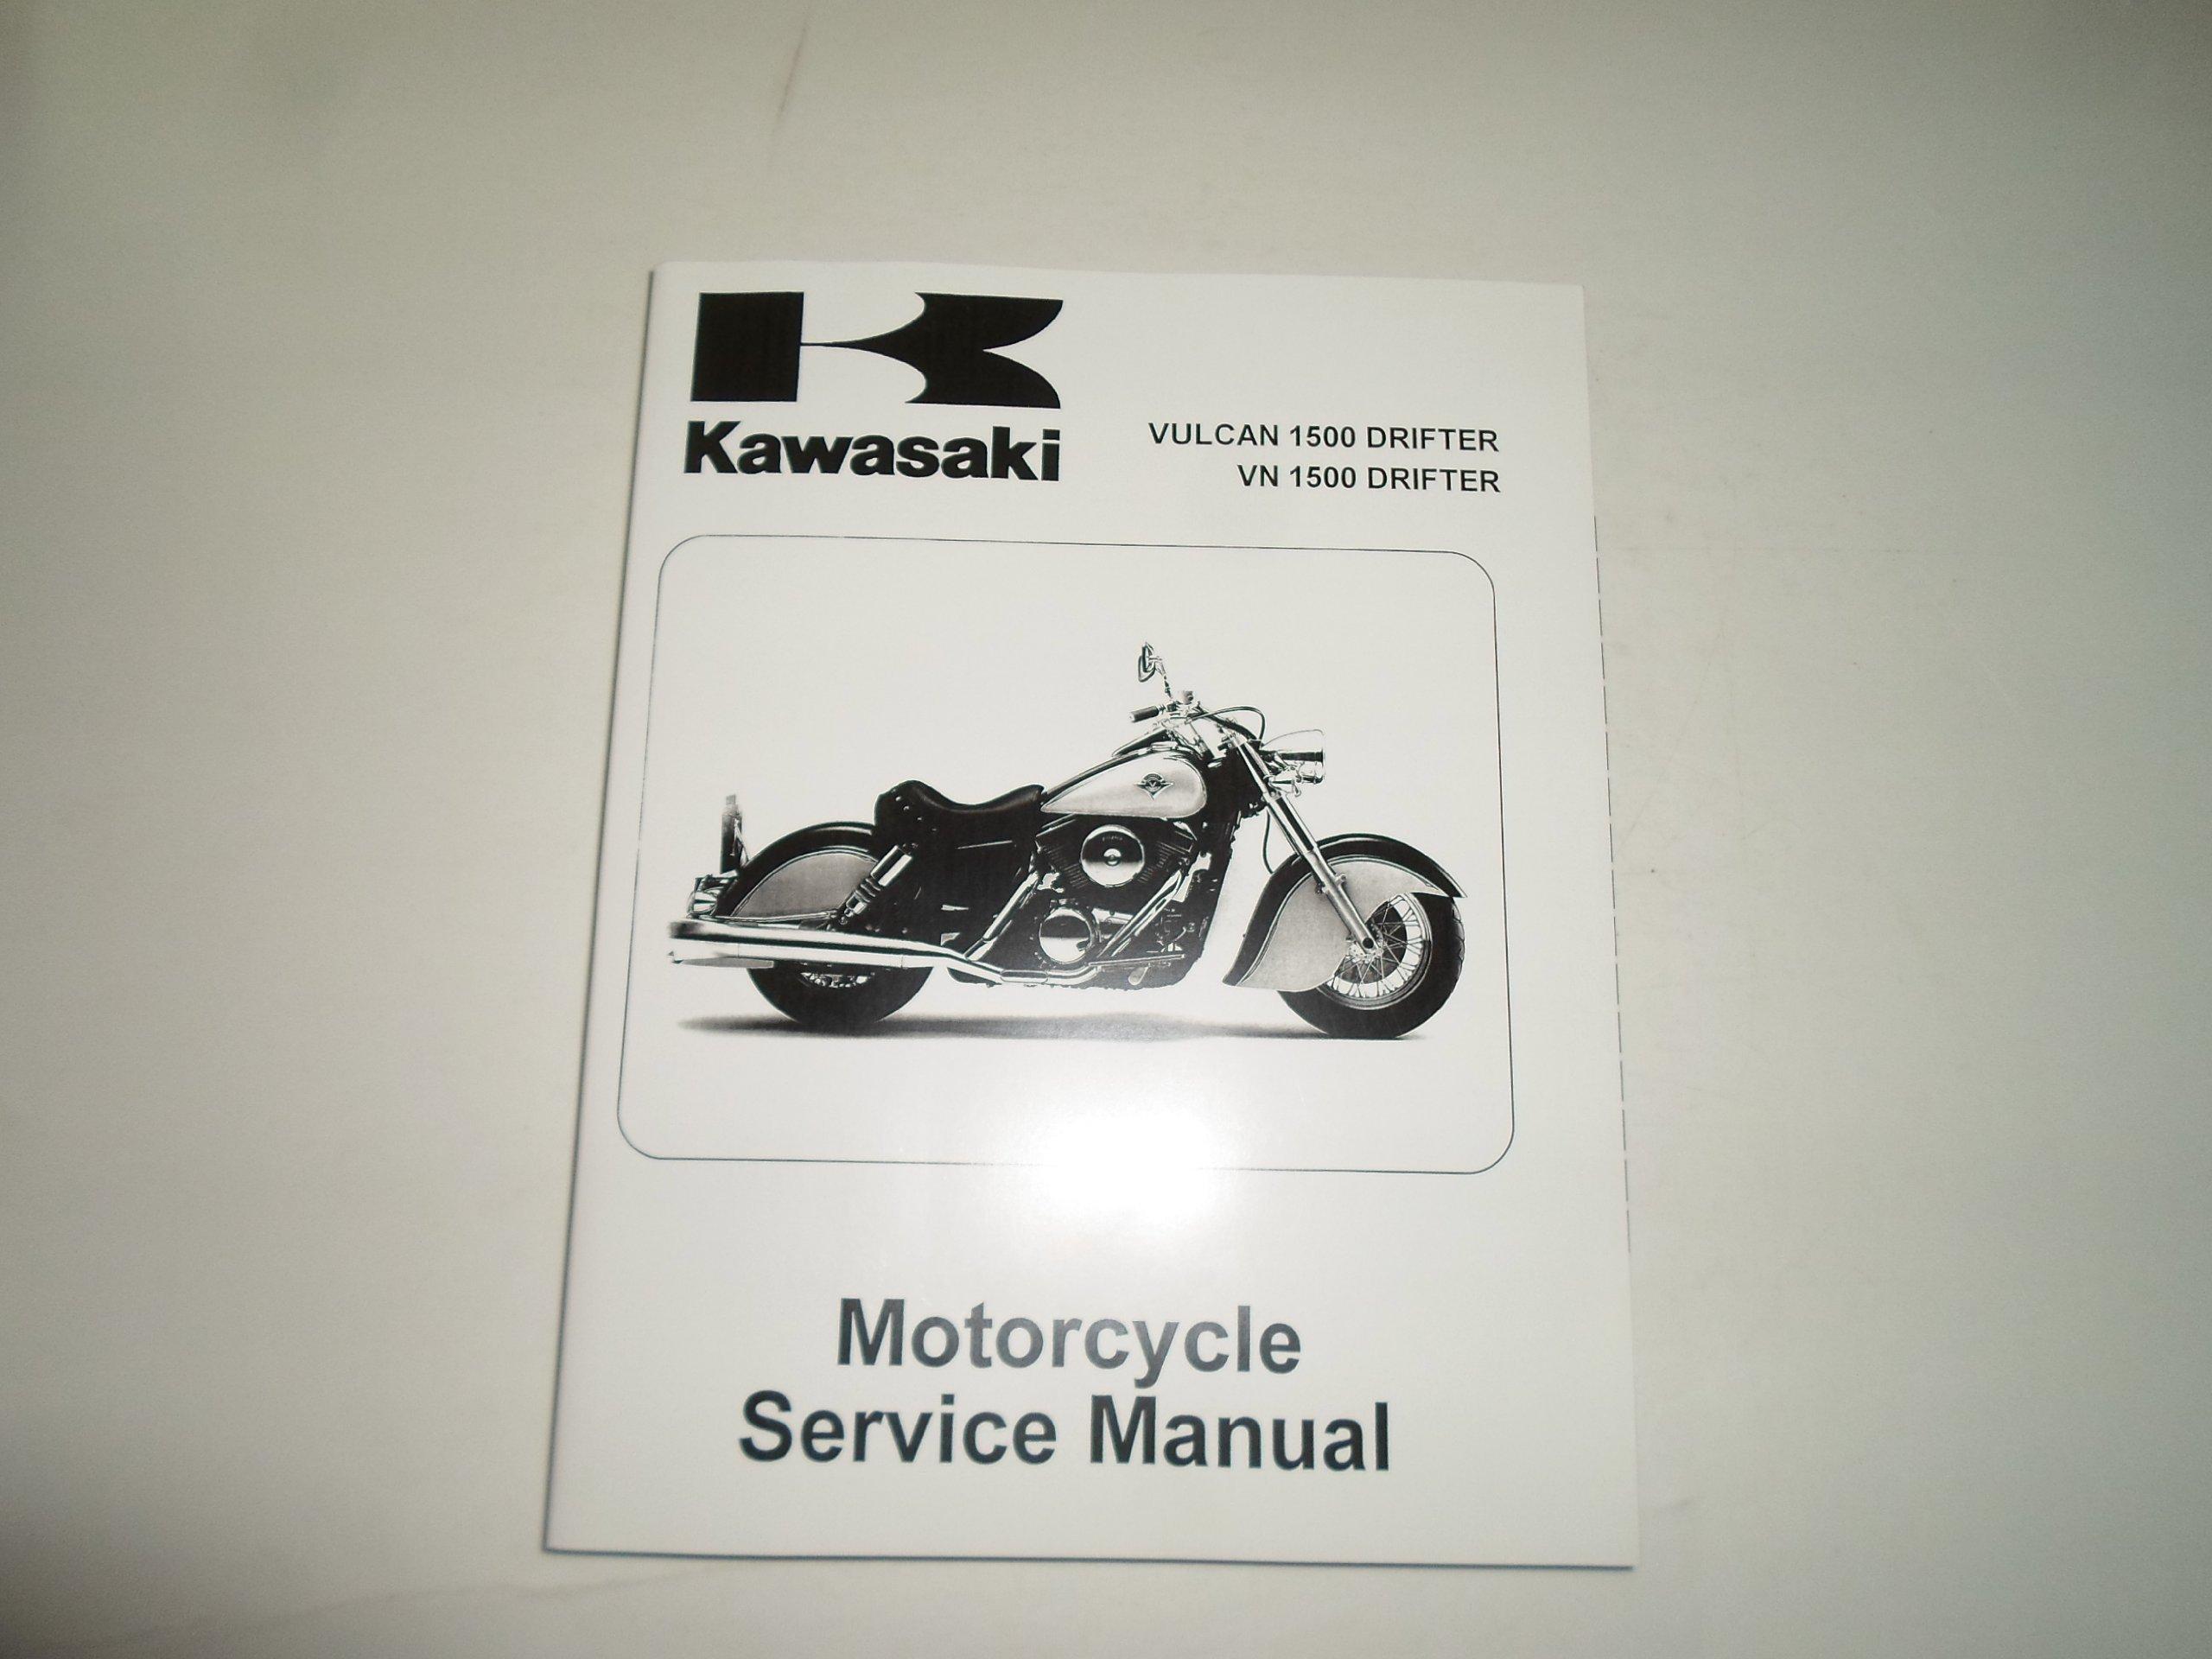 2001 2002 Vulcan 1500 Drifter VN1500 Drifter Motorcycle Service Manual:  KAWASAKI: Amazon.com: Books